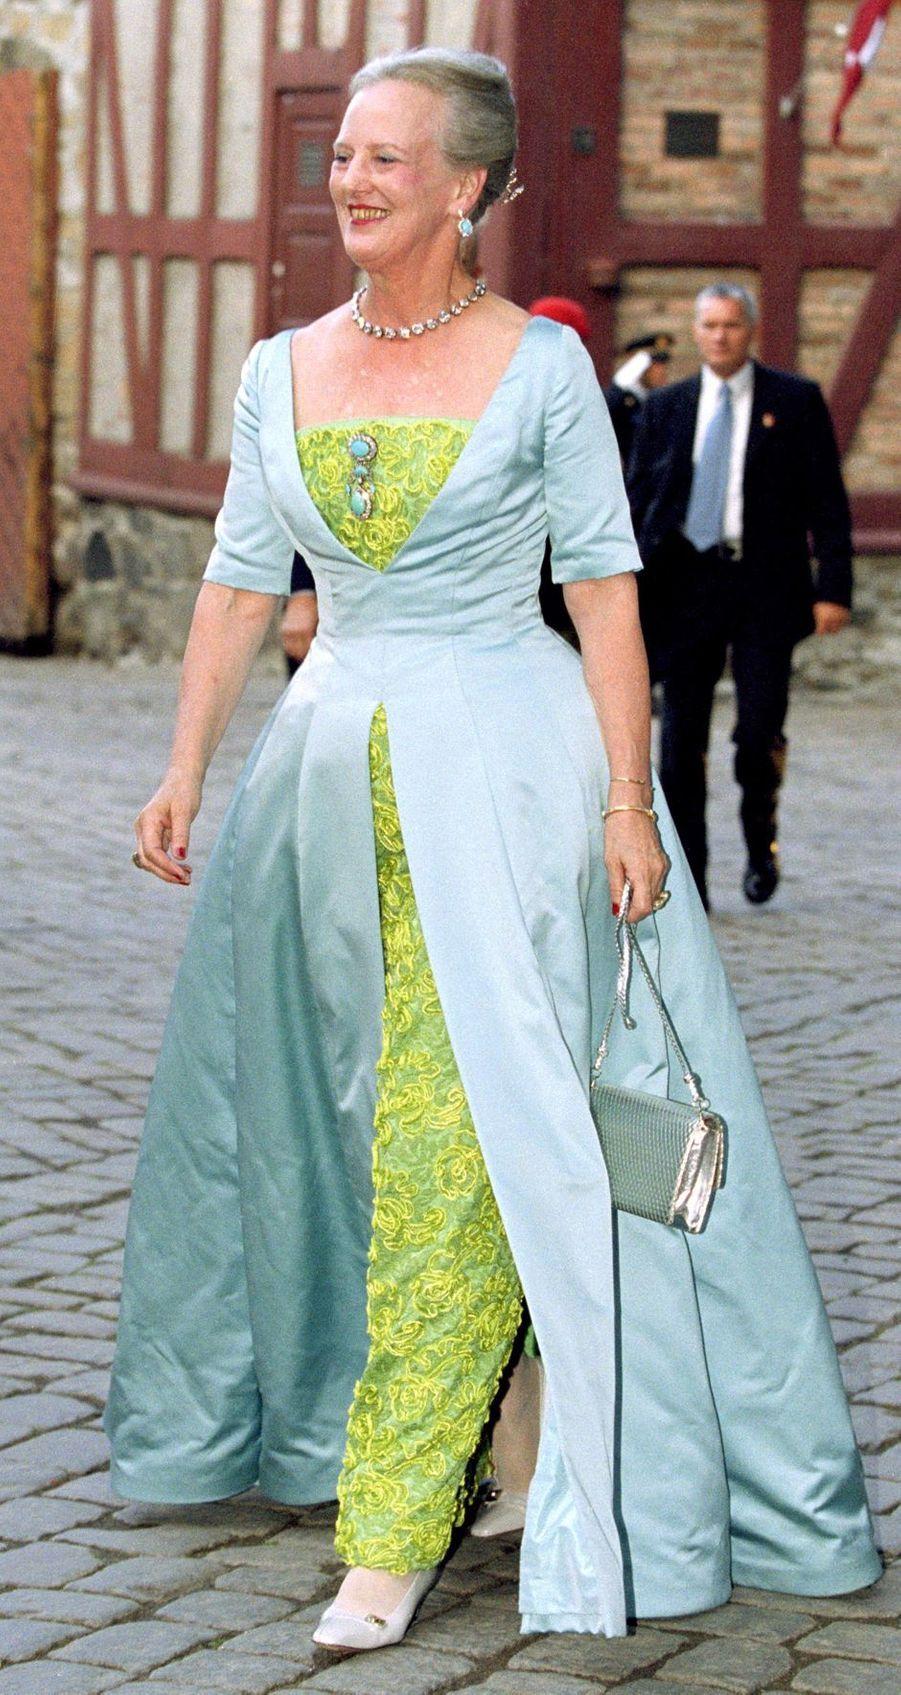 La reine Margrethe II de Danemark au mariage de la prince Haakon de Norvège, le 24 août 2001